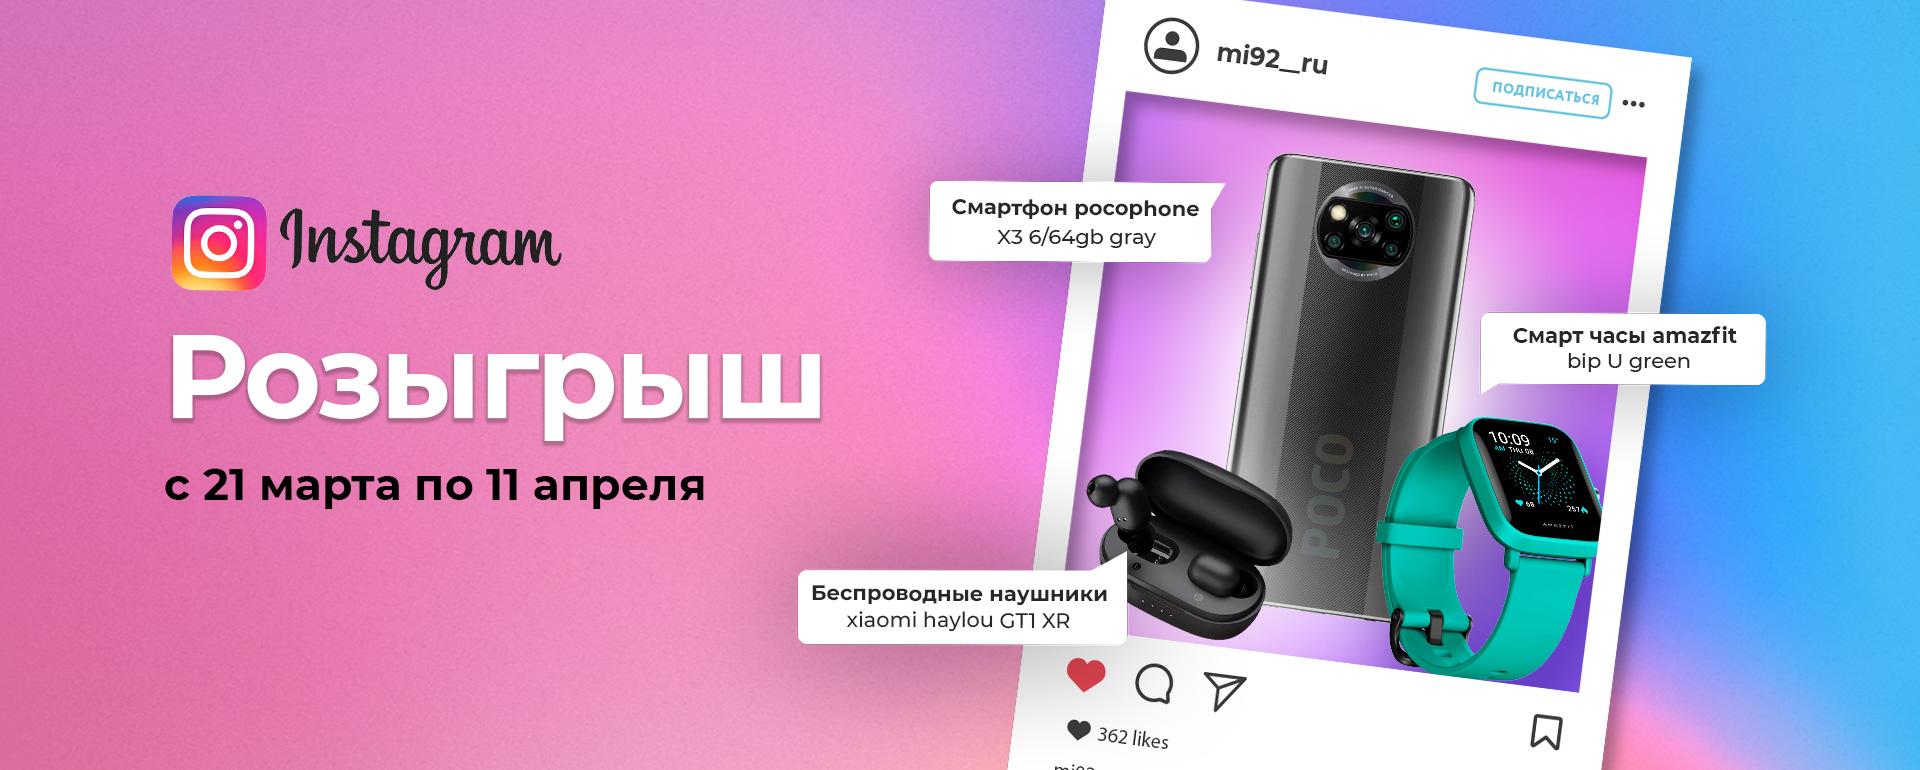 Instagram Розыгрыш